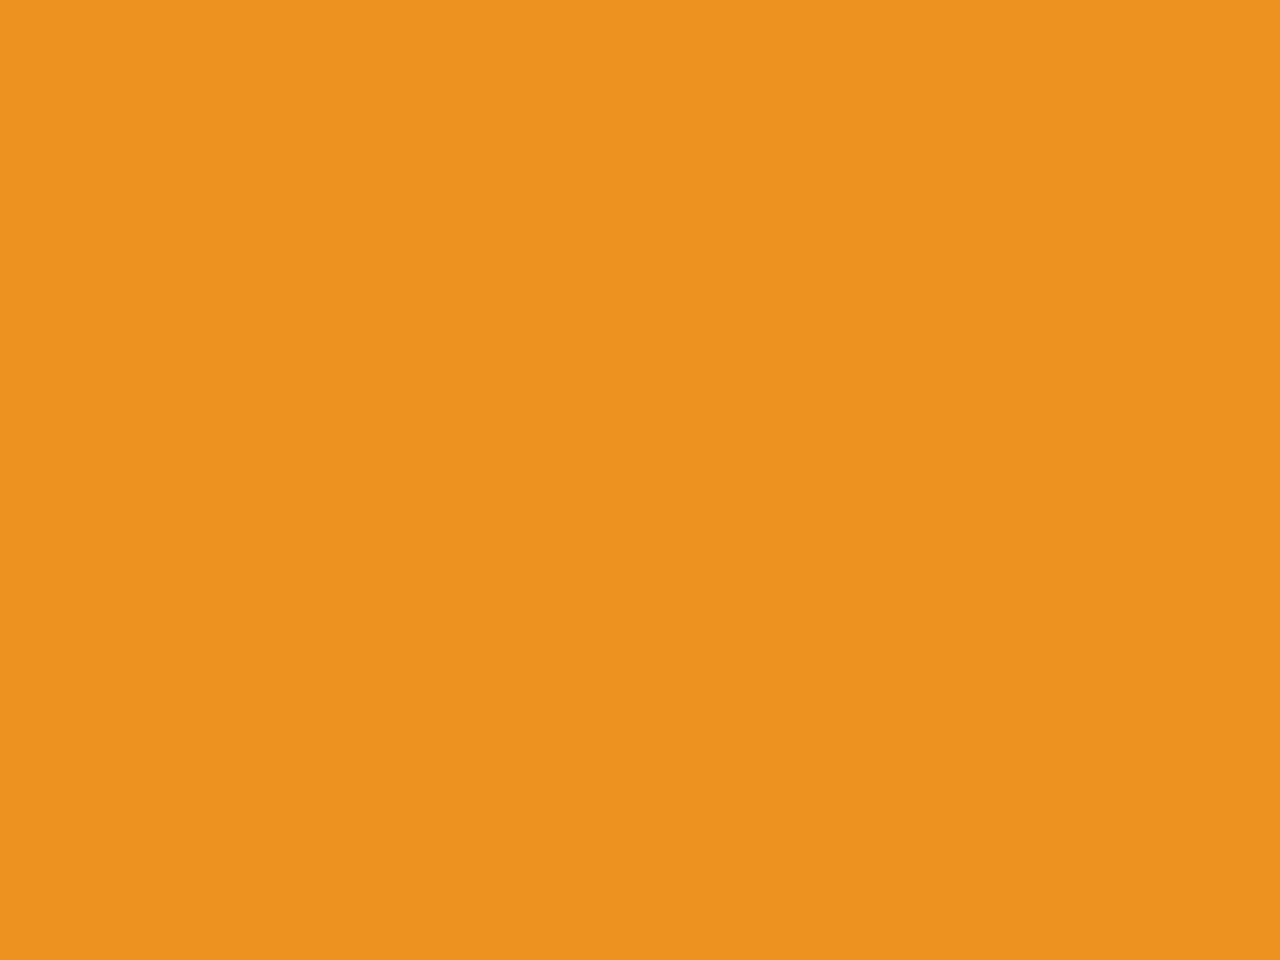 1280x960 Carrot Orange Solid Color Background